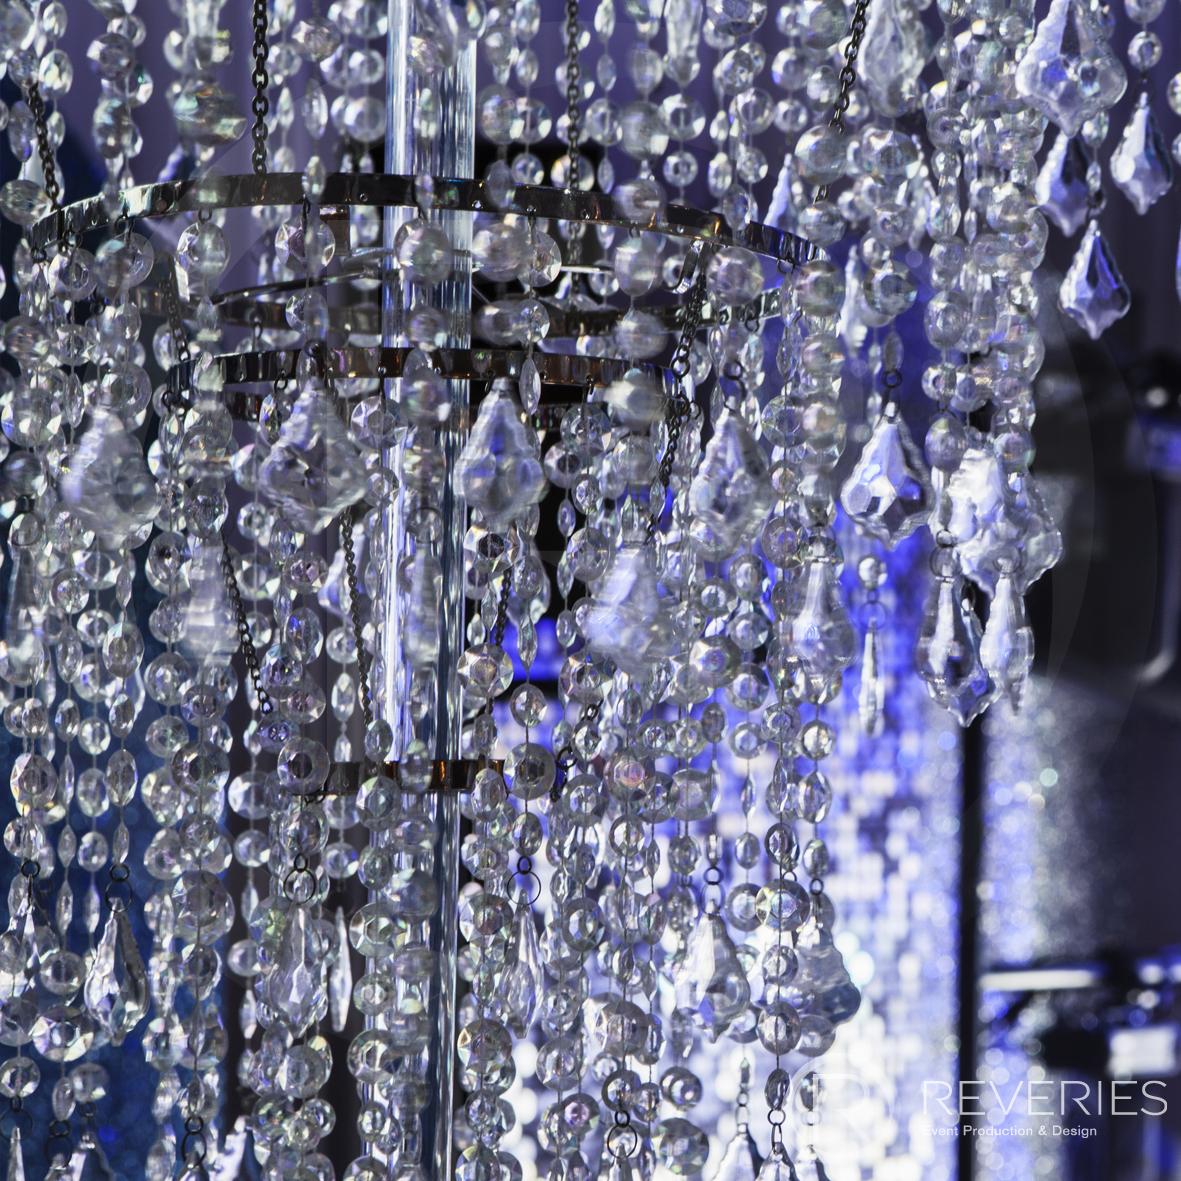 Snowman Spectacular 2016 - Giant chandelier detail